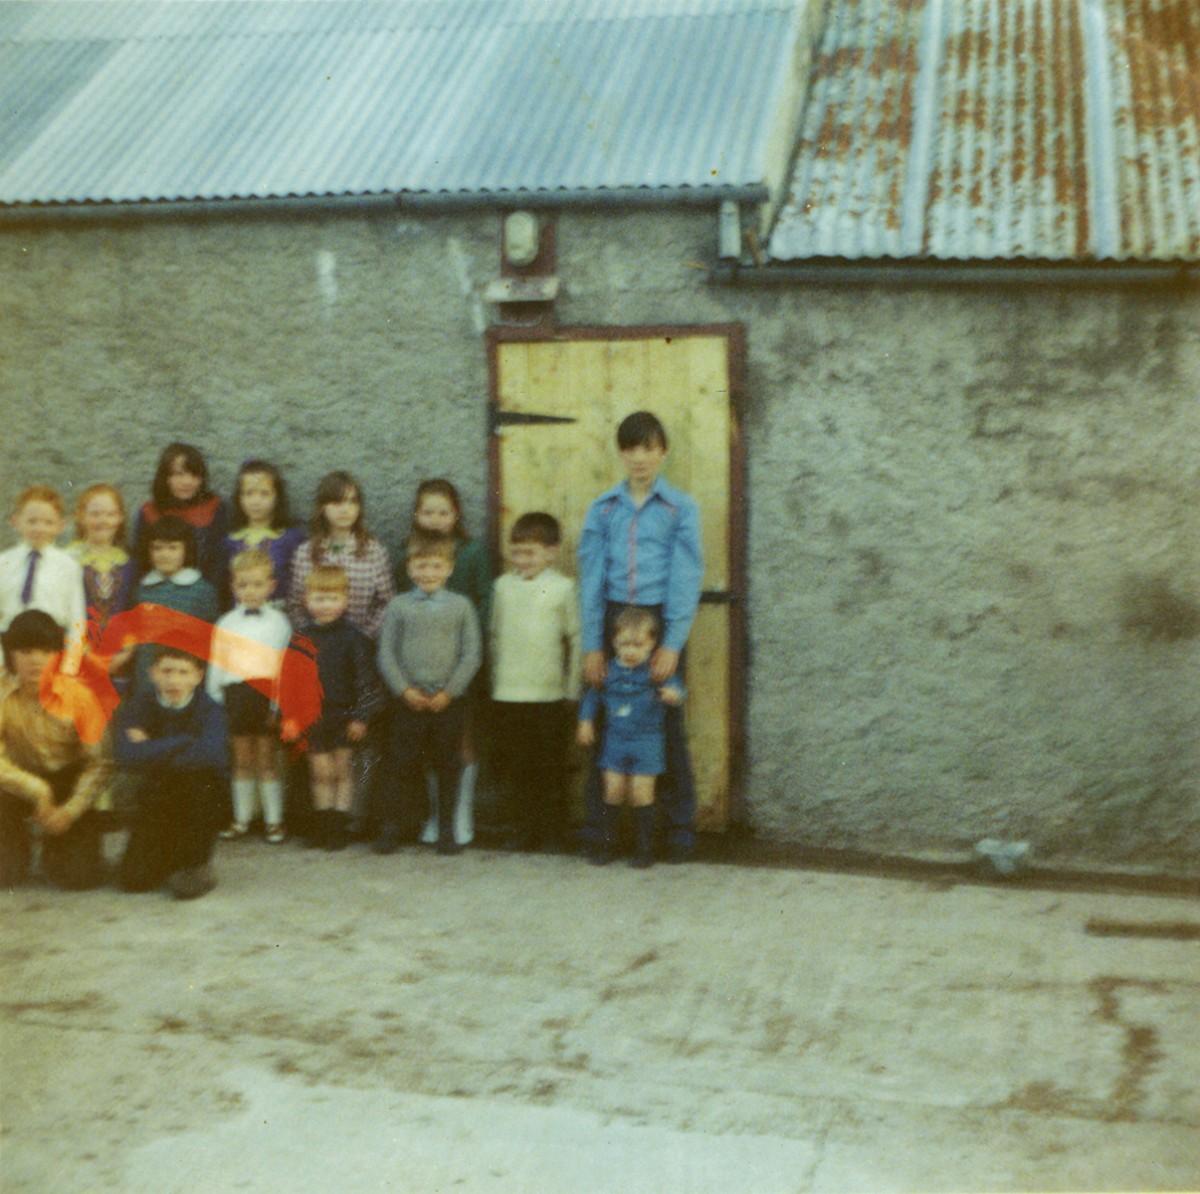 Conlon // Philadelphia & County Monaghan :: Conlon children in farmyard, 1972